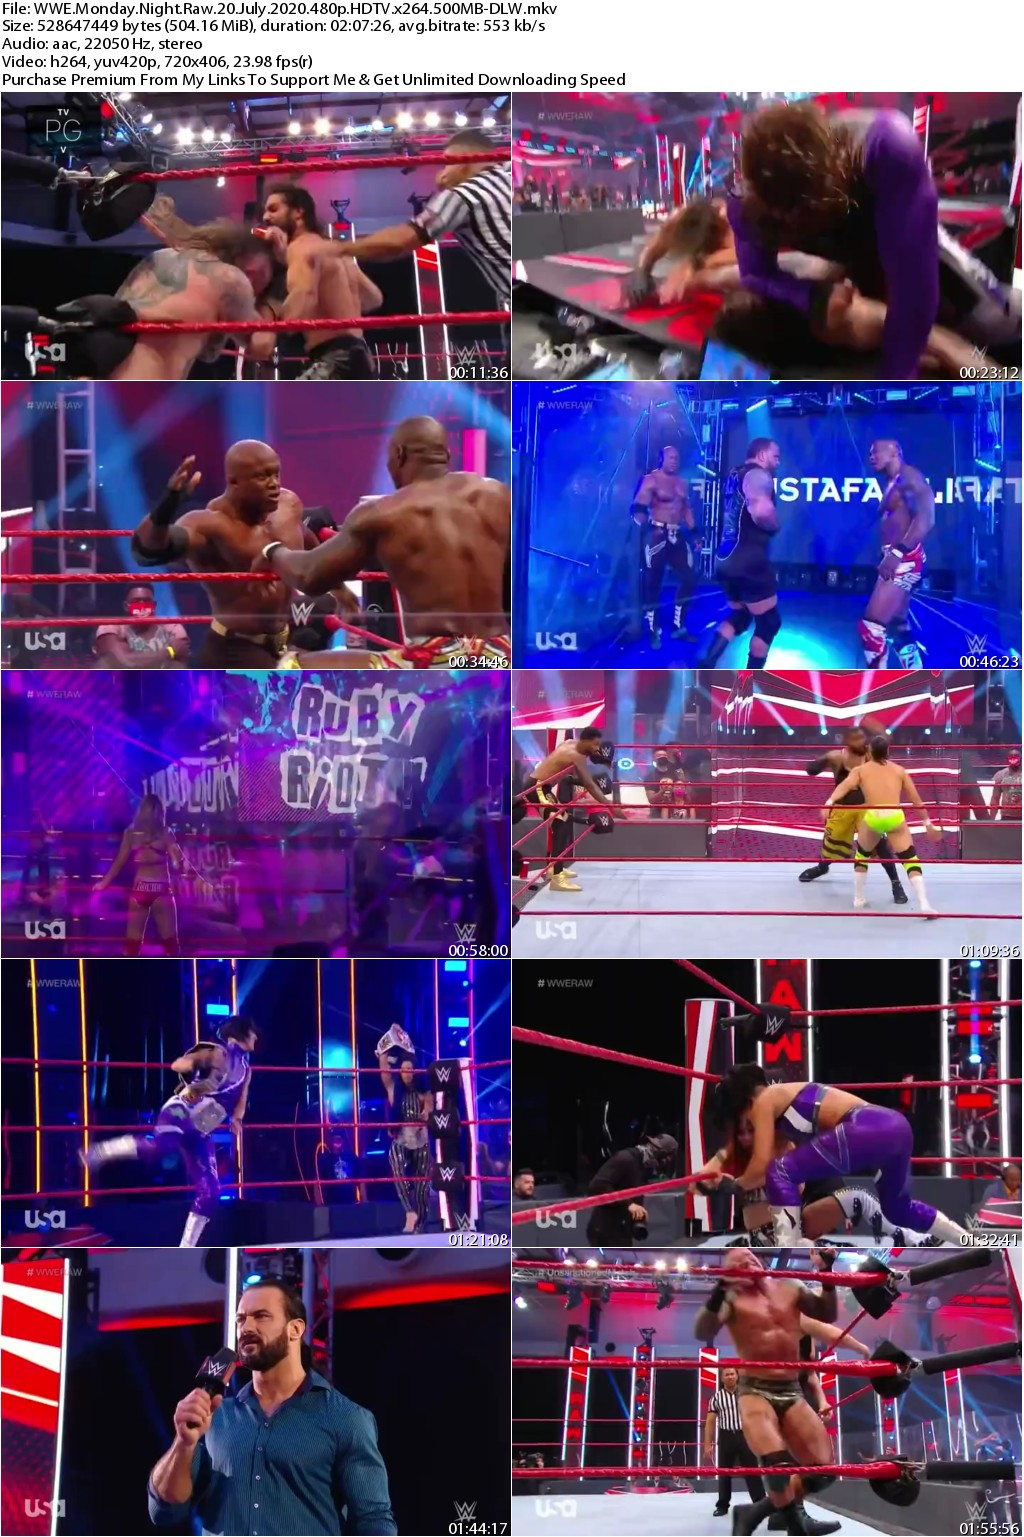 WWE Monday Night Raw 20 July 2020 480p HDTV x264 500MB-DLW